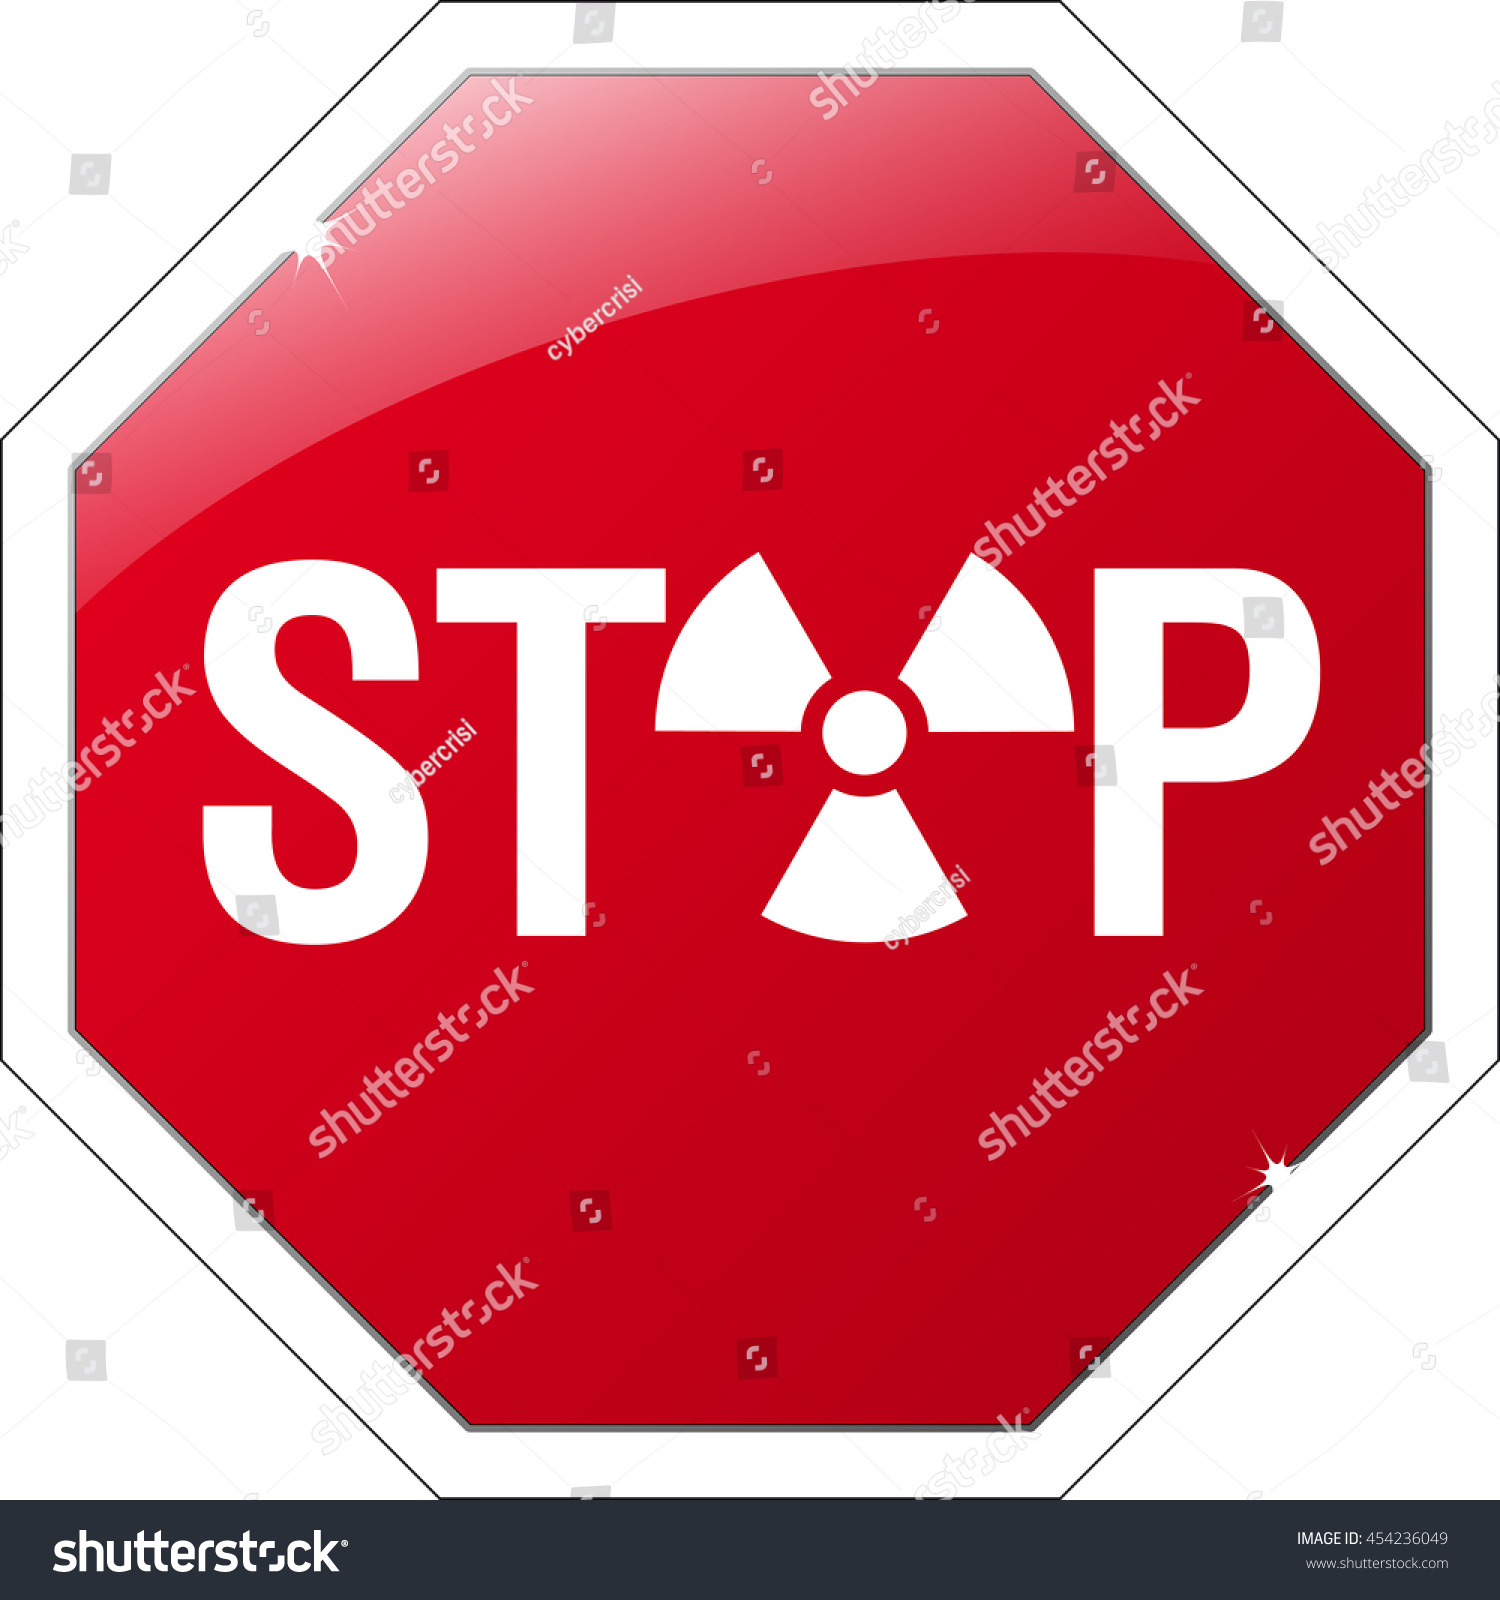 Stop sign radioactive symbol instead o stock vector 454236049 a stop sign with an radioactive symbol instead of an o biocorpaavc